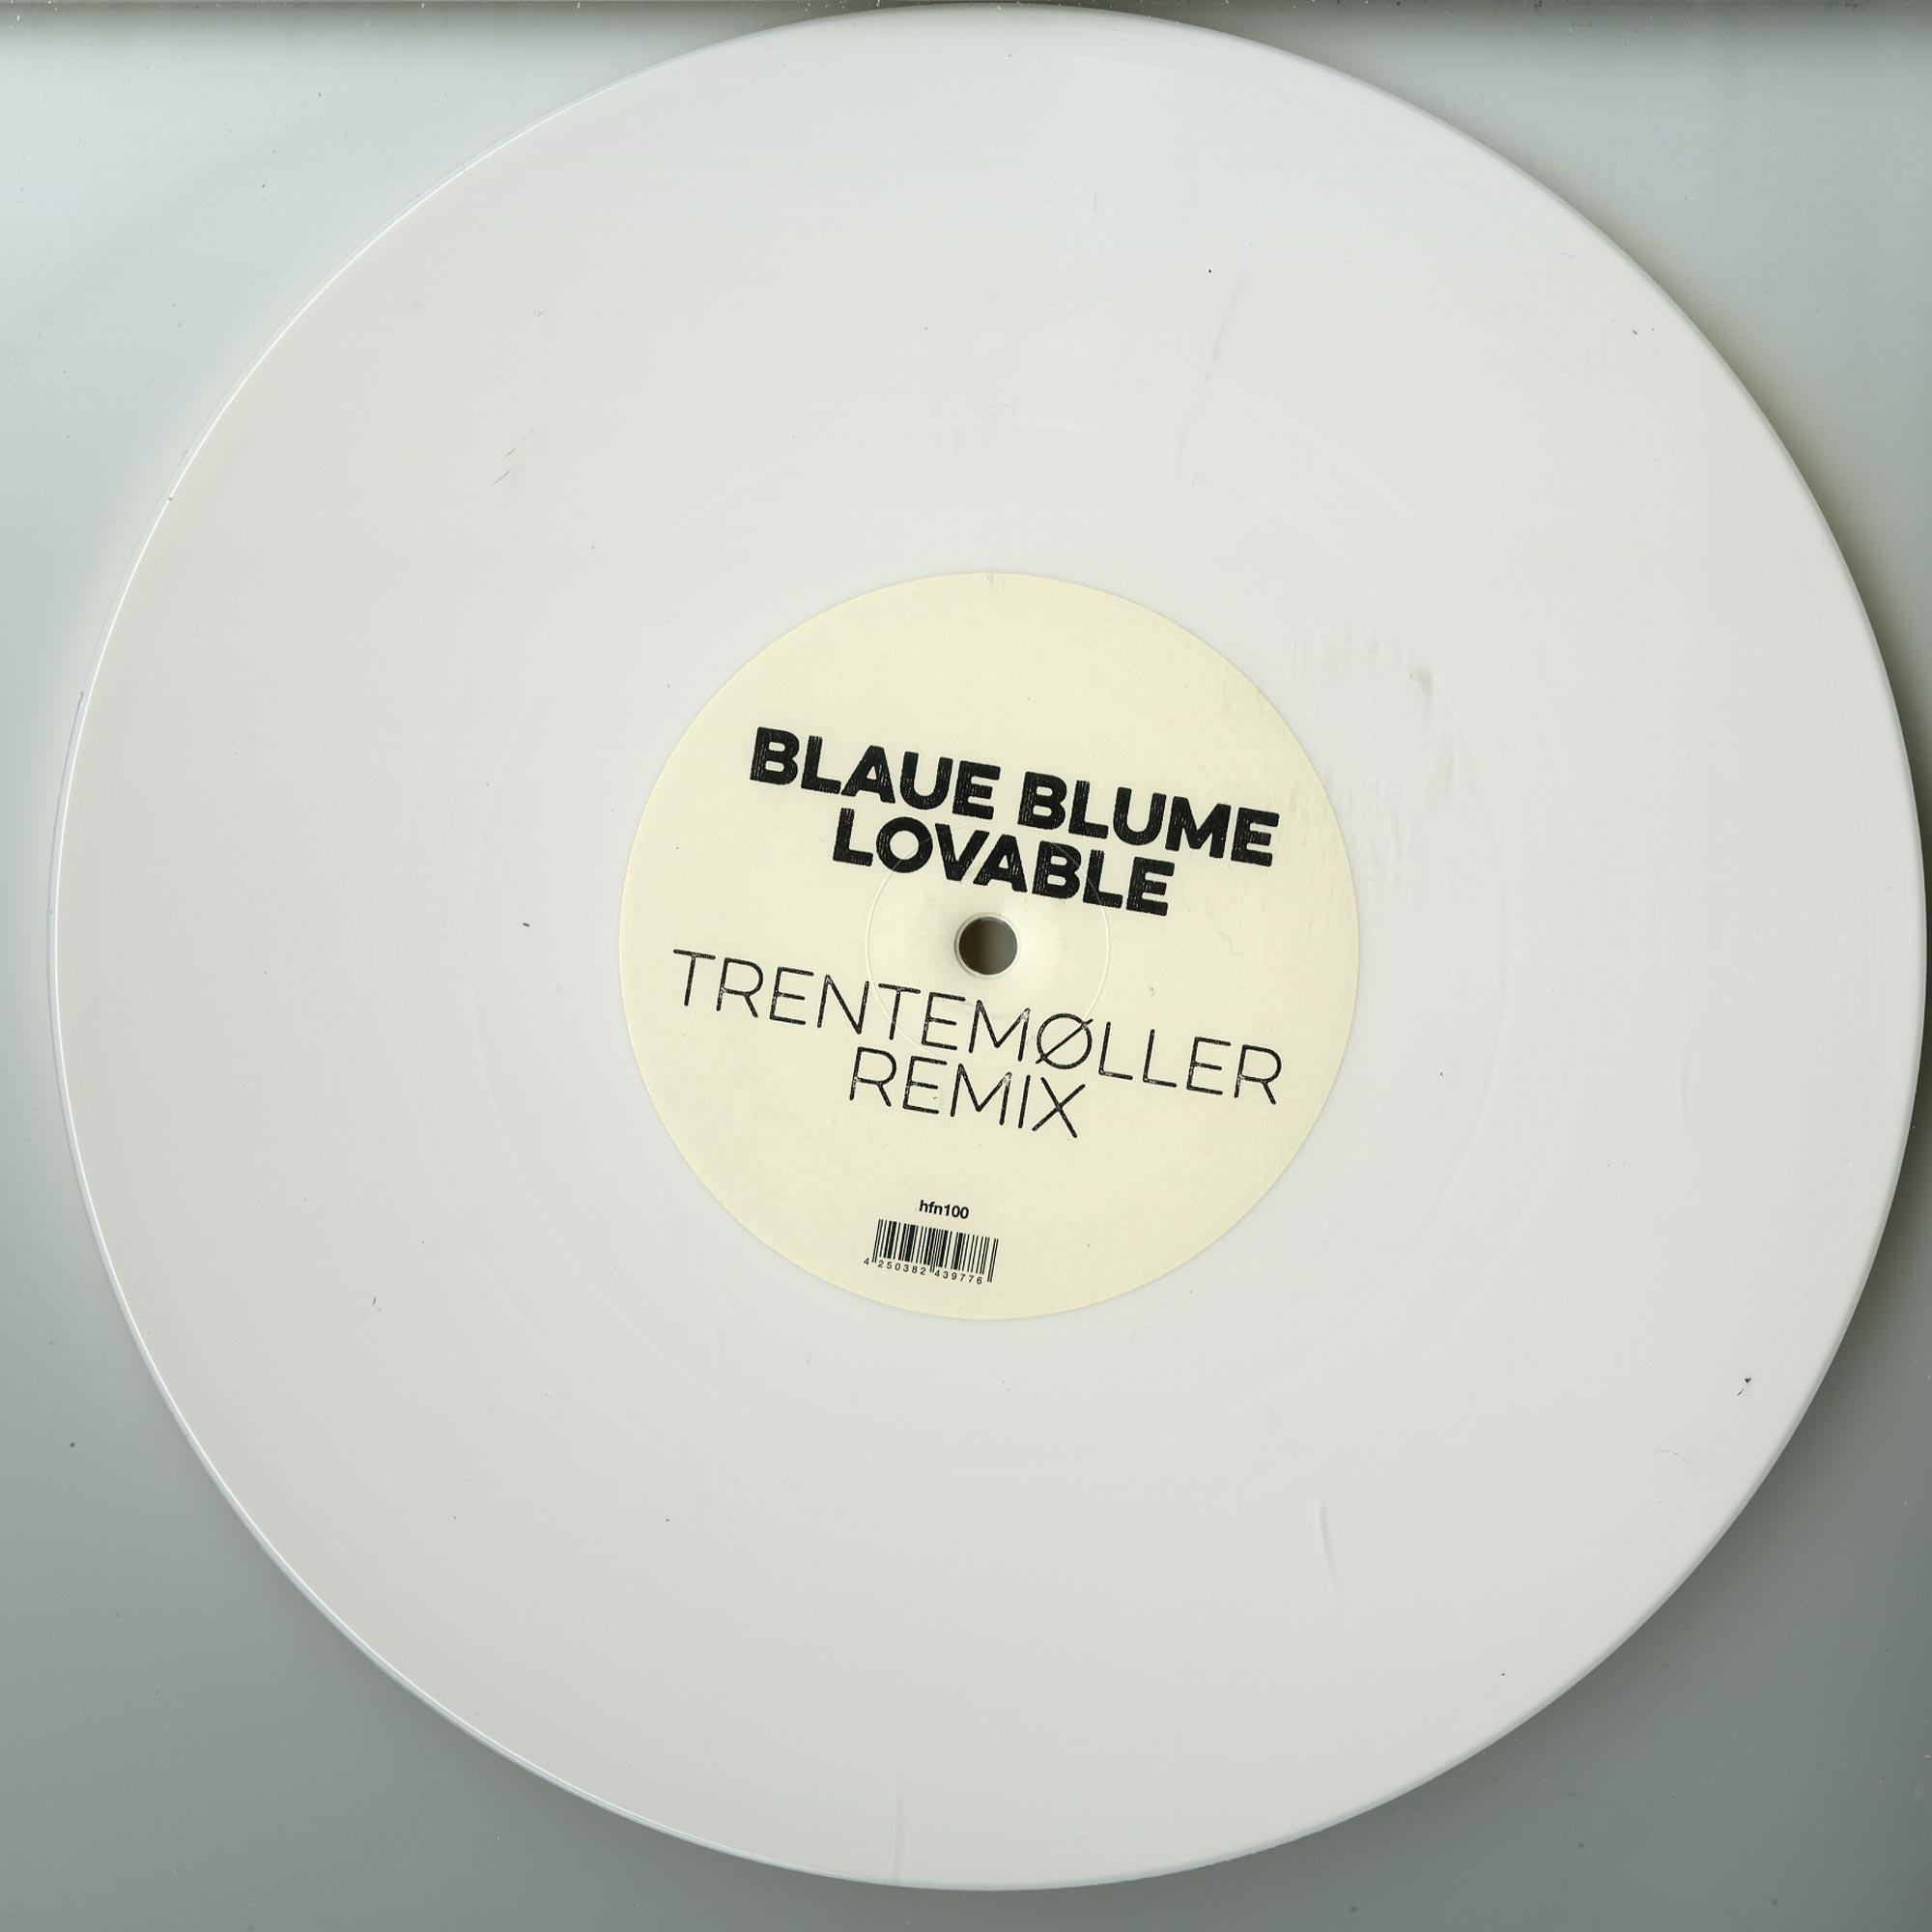 Blaue Blume - LOVABLE